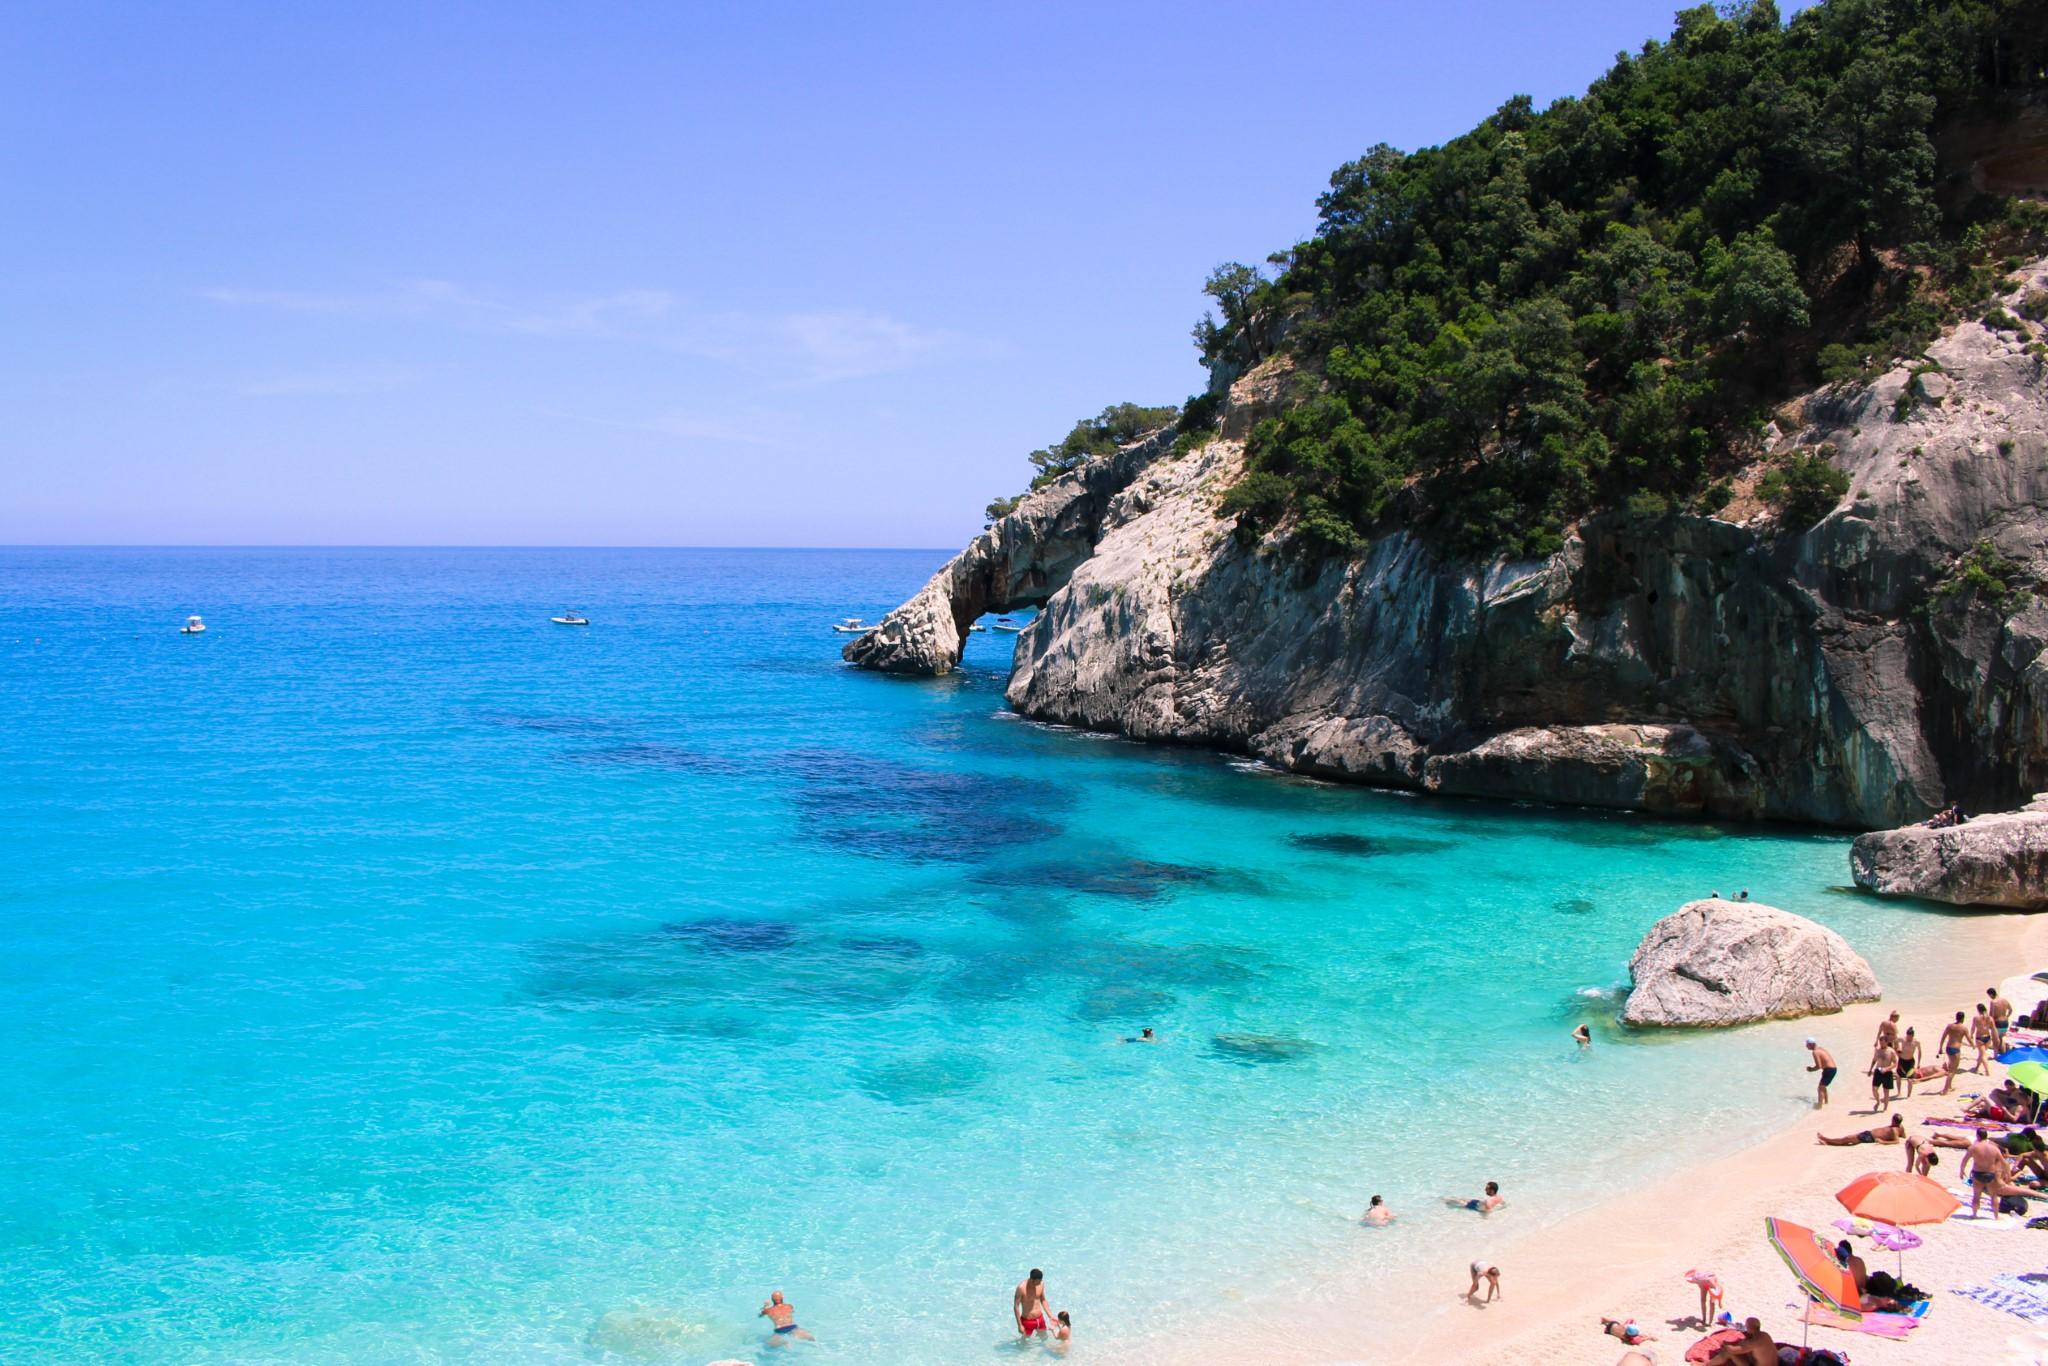 Cala Goloritzè beach in Sardinia,Italy. June 2019